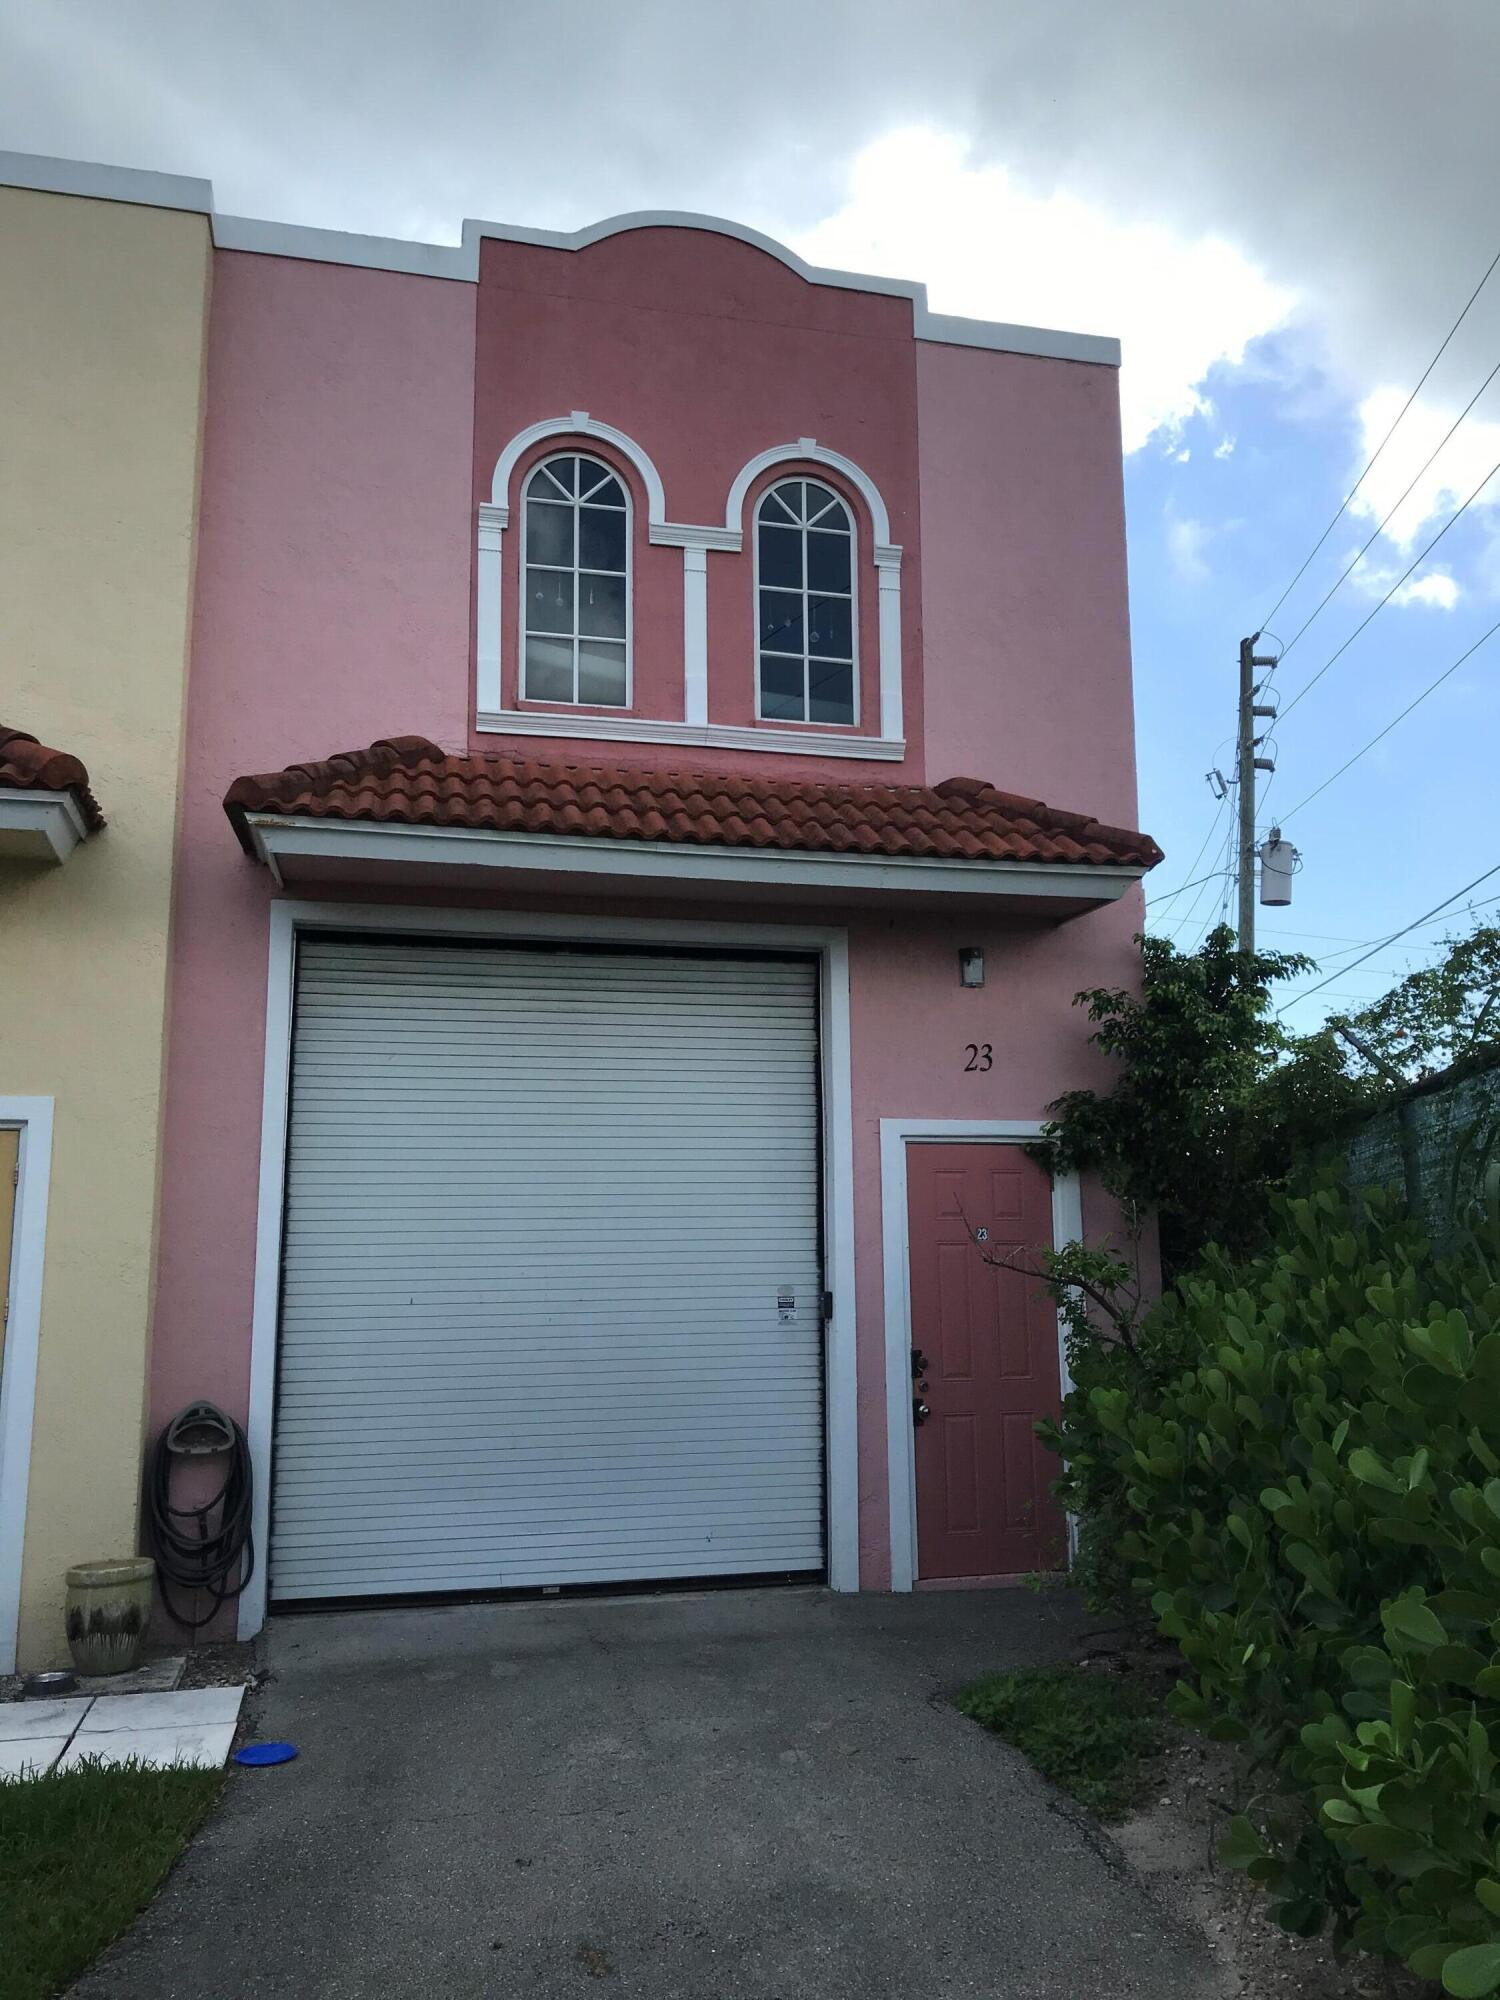 2727 Rosemary Unit 23, West Palm Beach, Florida 33407